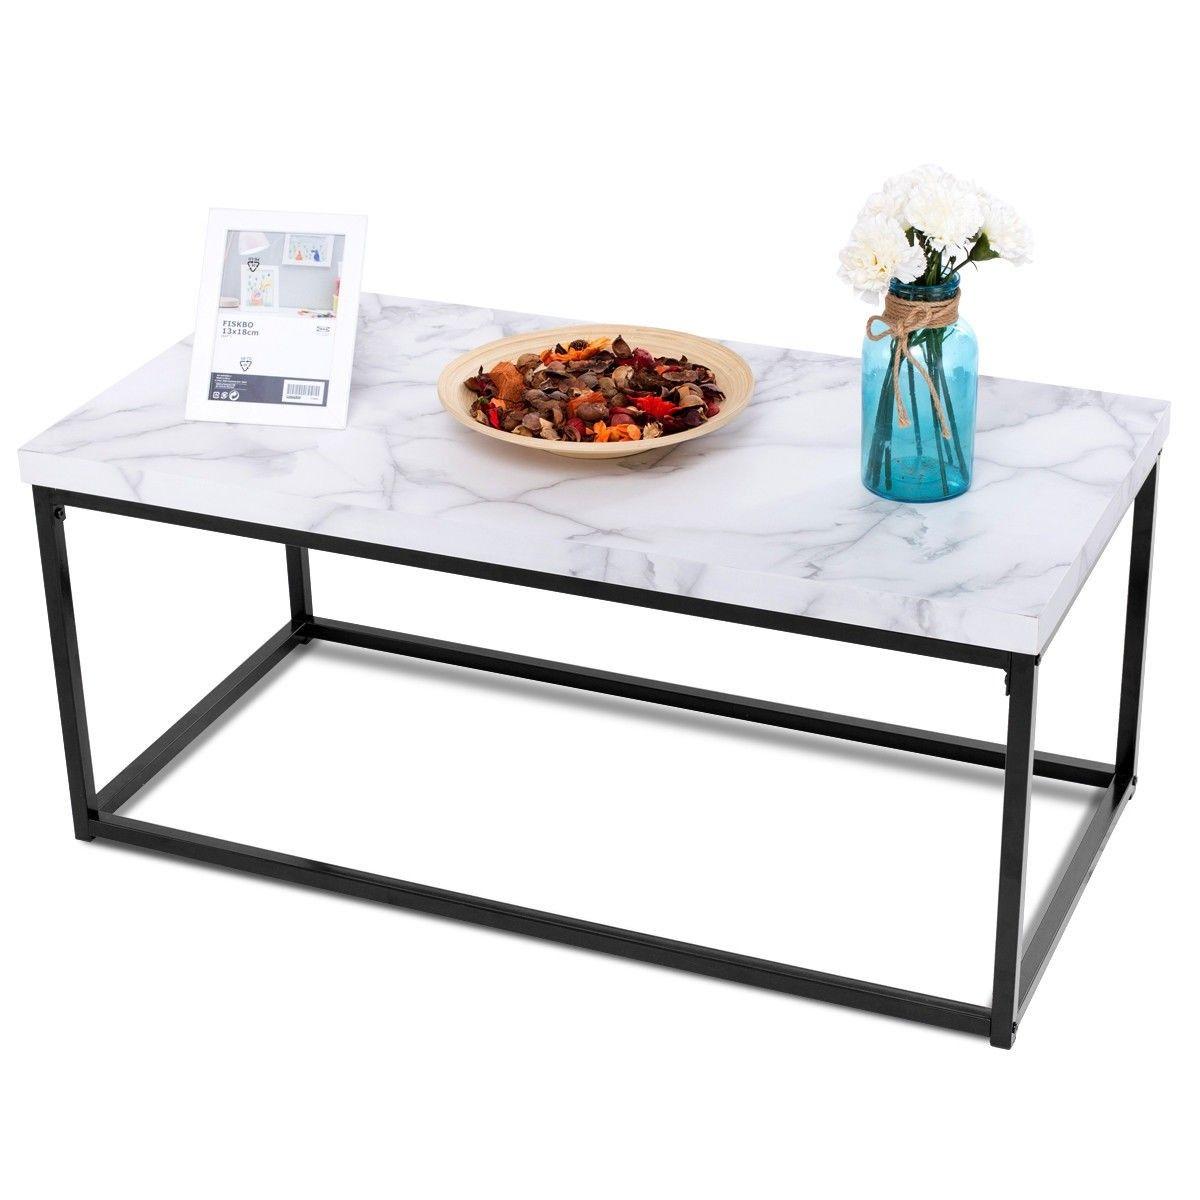 Modern Rectangular Cocktail Coffee Table Coffee Table Metal Frame Coffee Table Metal Coffee Table [ 1200 x 1200 Pixel ]